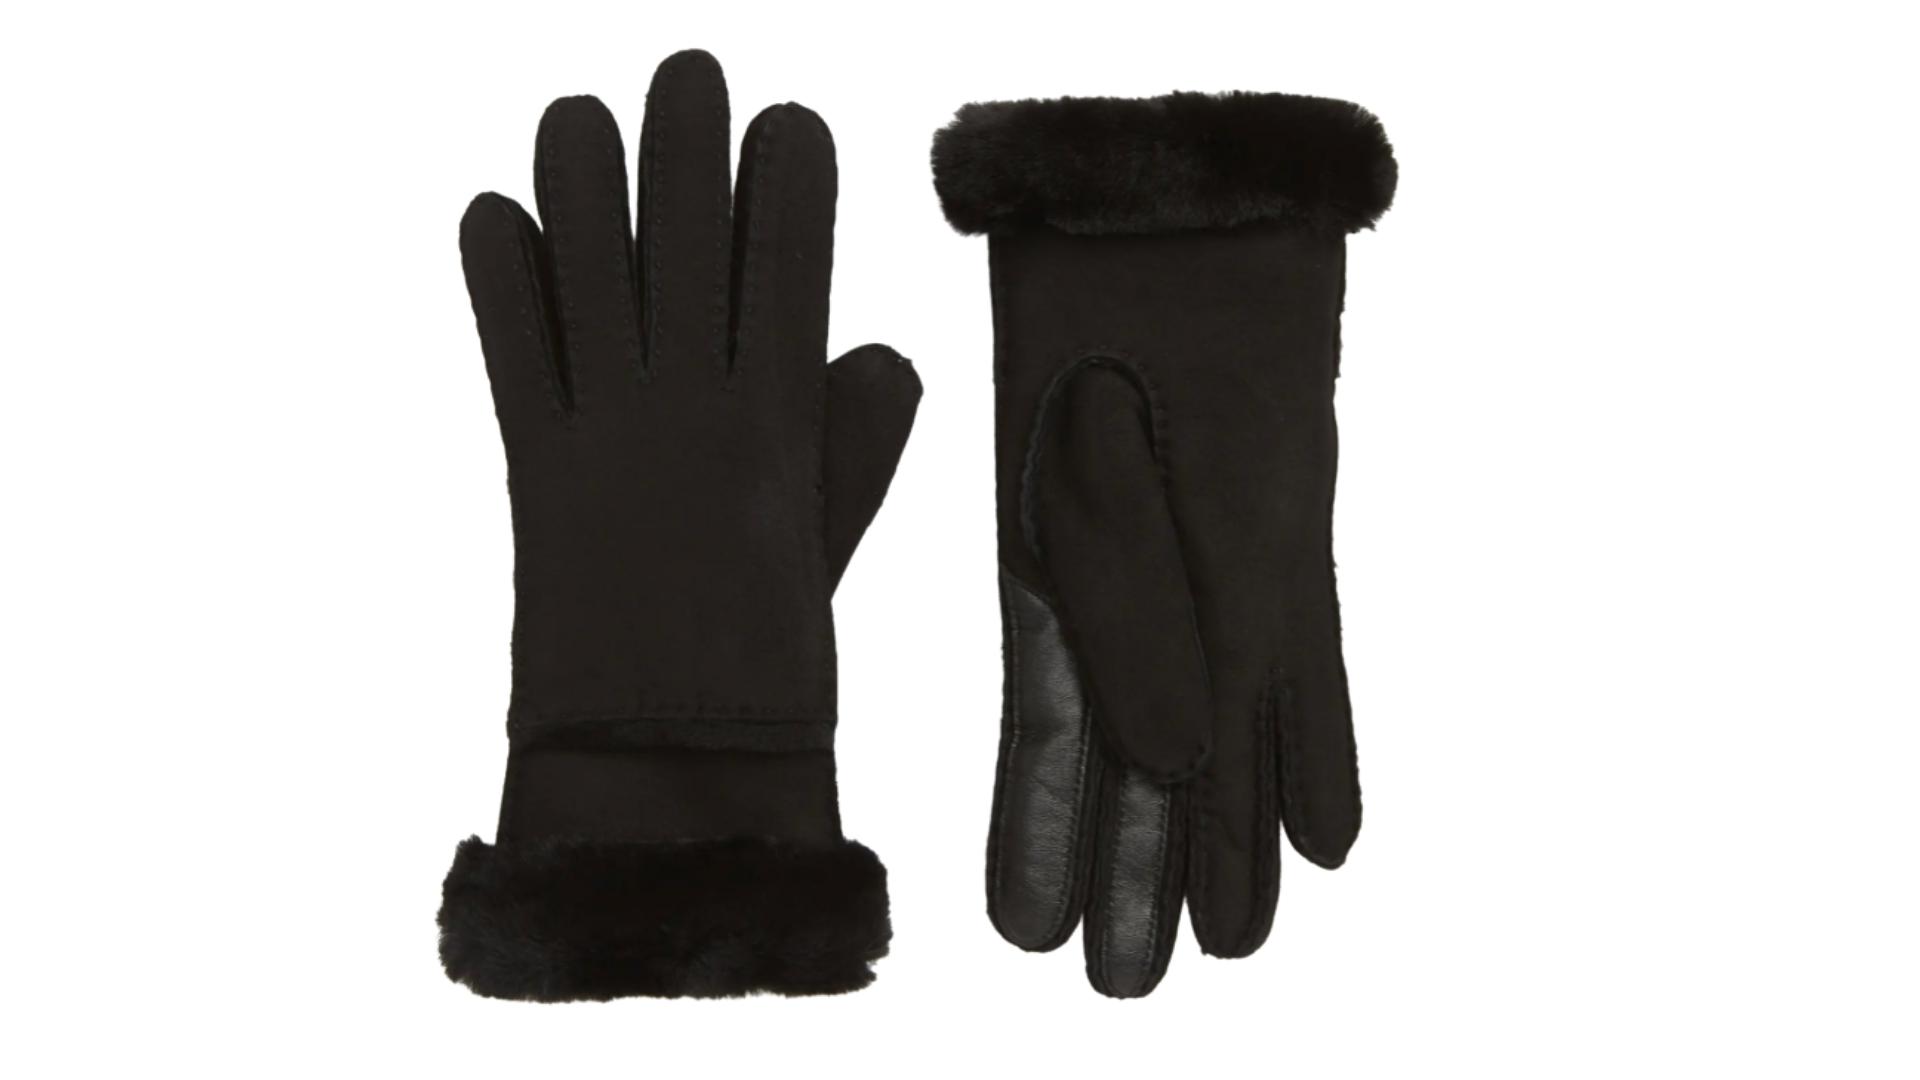 Ugg seamed best winter gloves